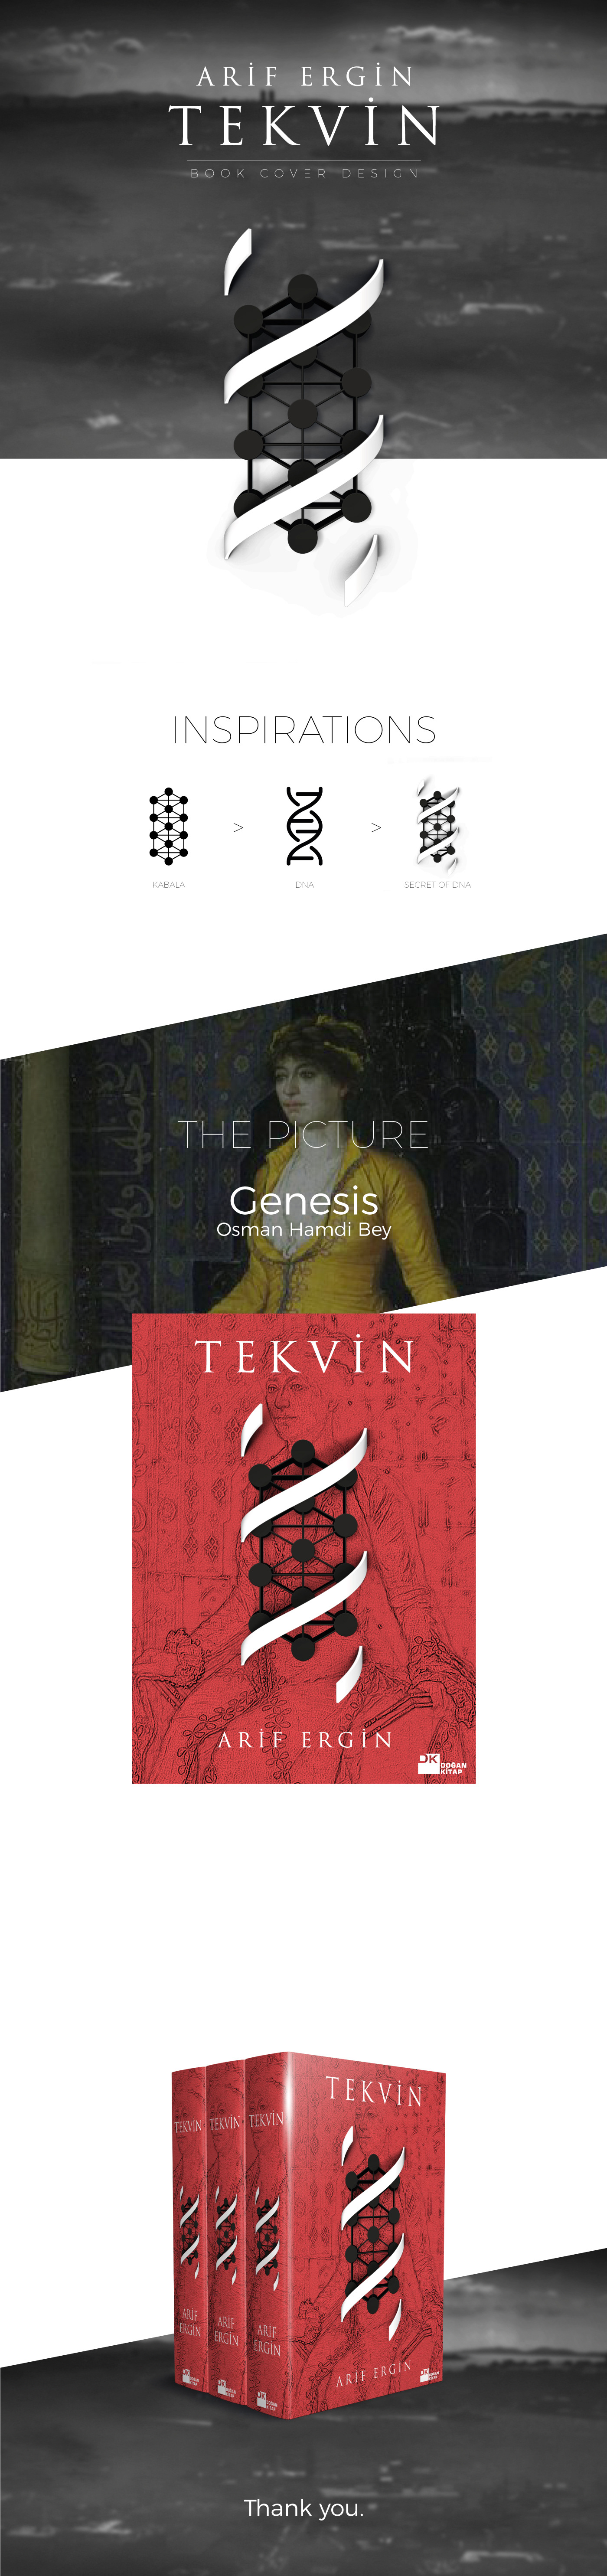 cover book book cover cover design book design